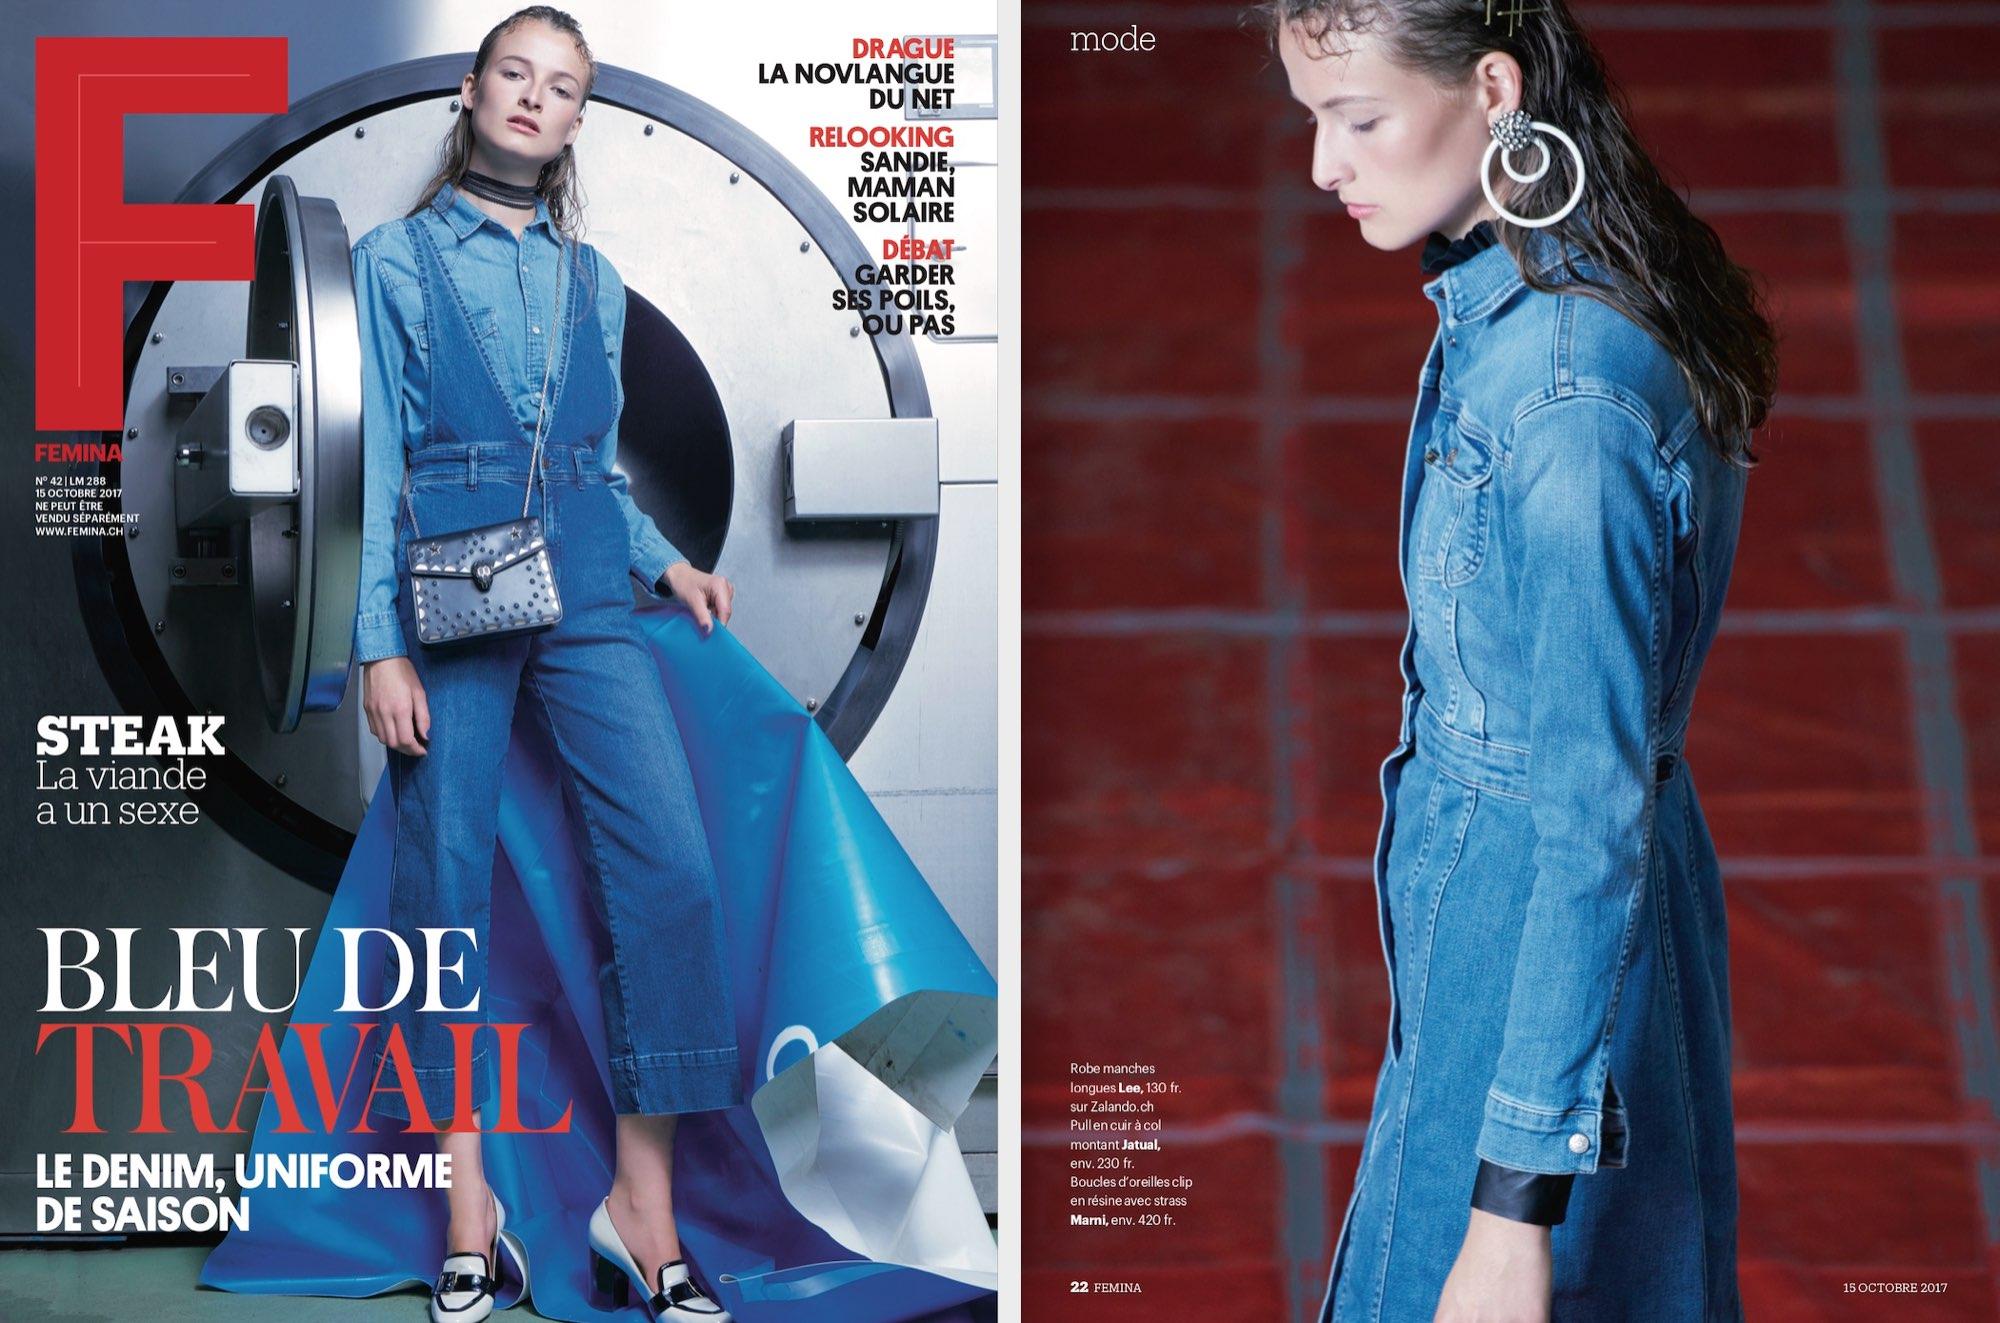 Hair, Nail, Make-up und Fashion styling portfolio / fabienne-pauli - femina-bleu-de-travail--jeans---ID291-1.jpeg?v=1585680808